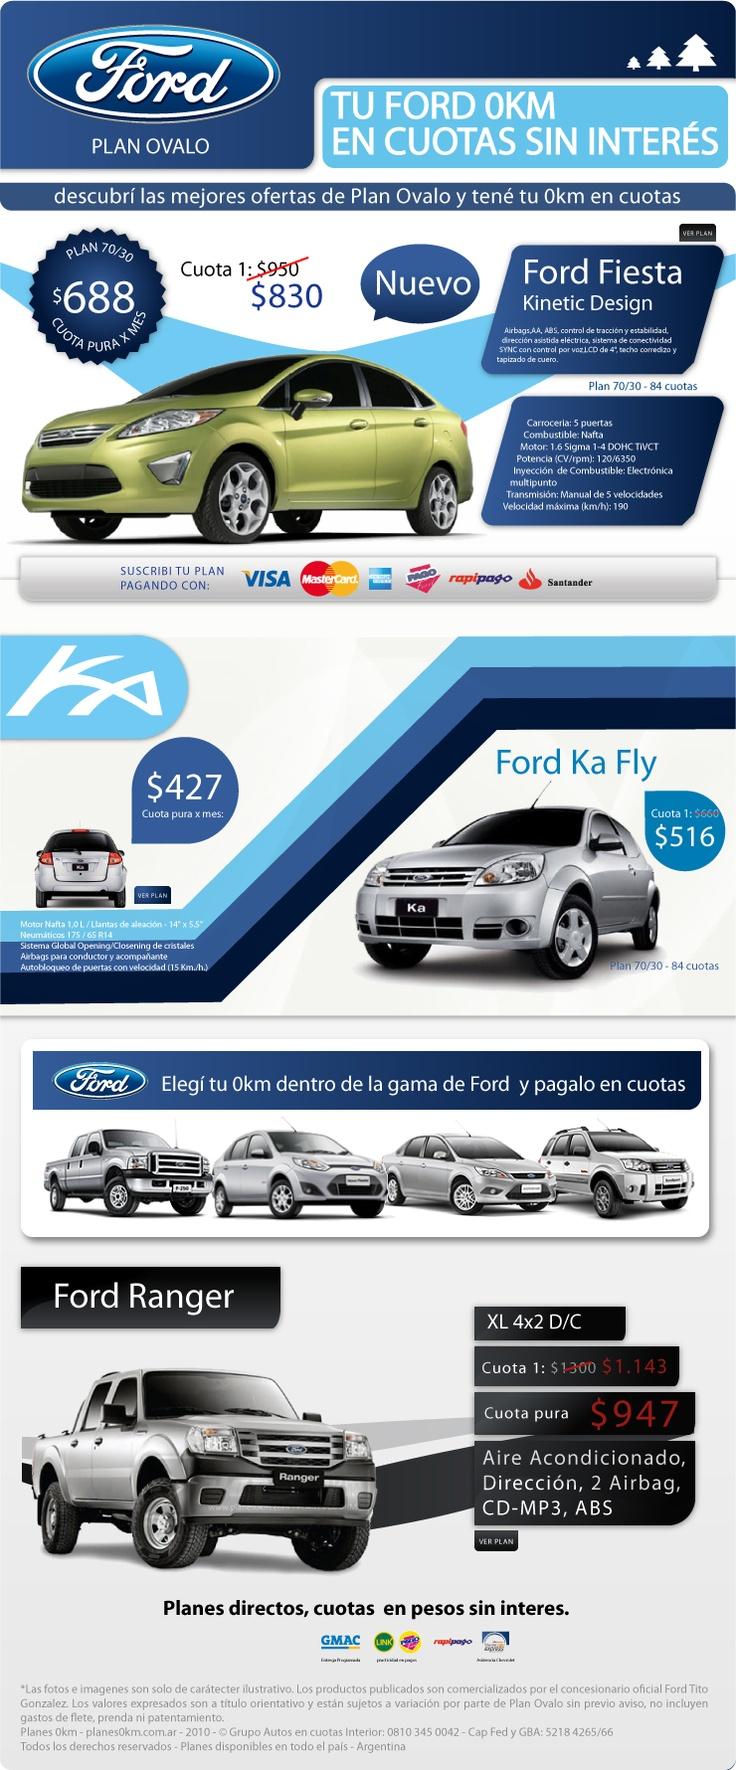 Newsletter para Autos en Cuotas